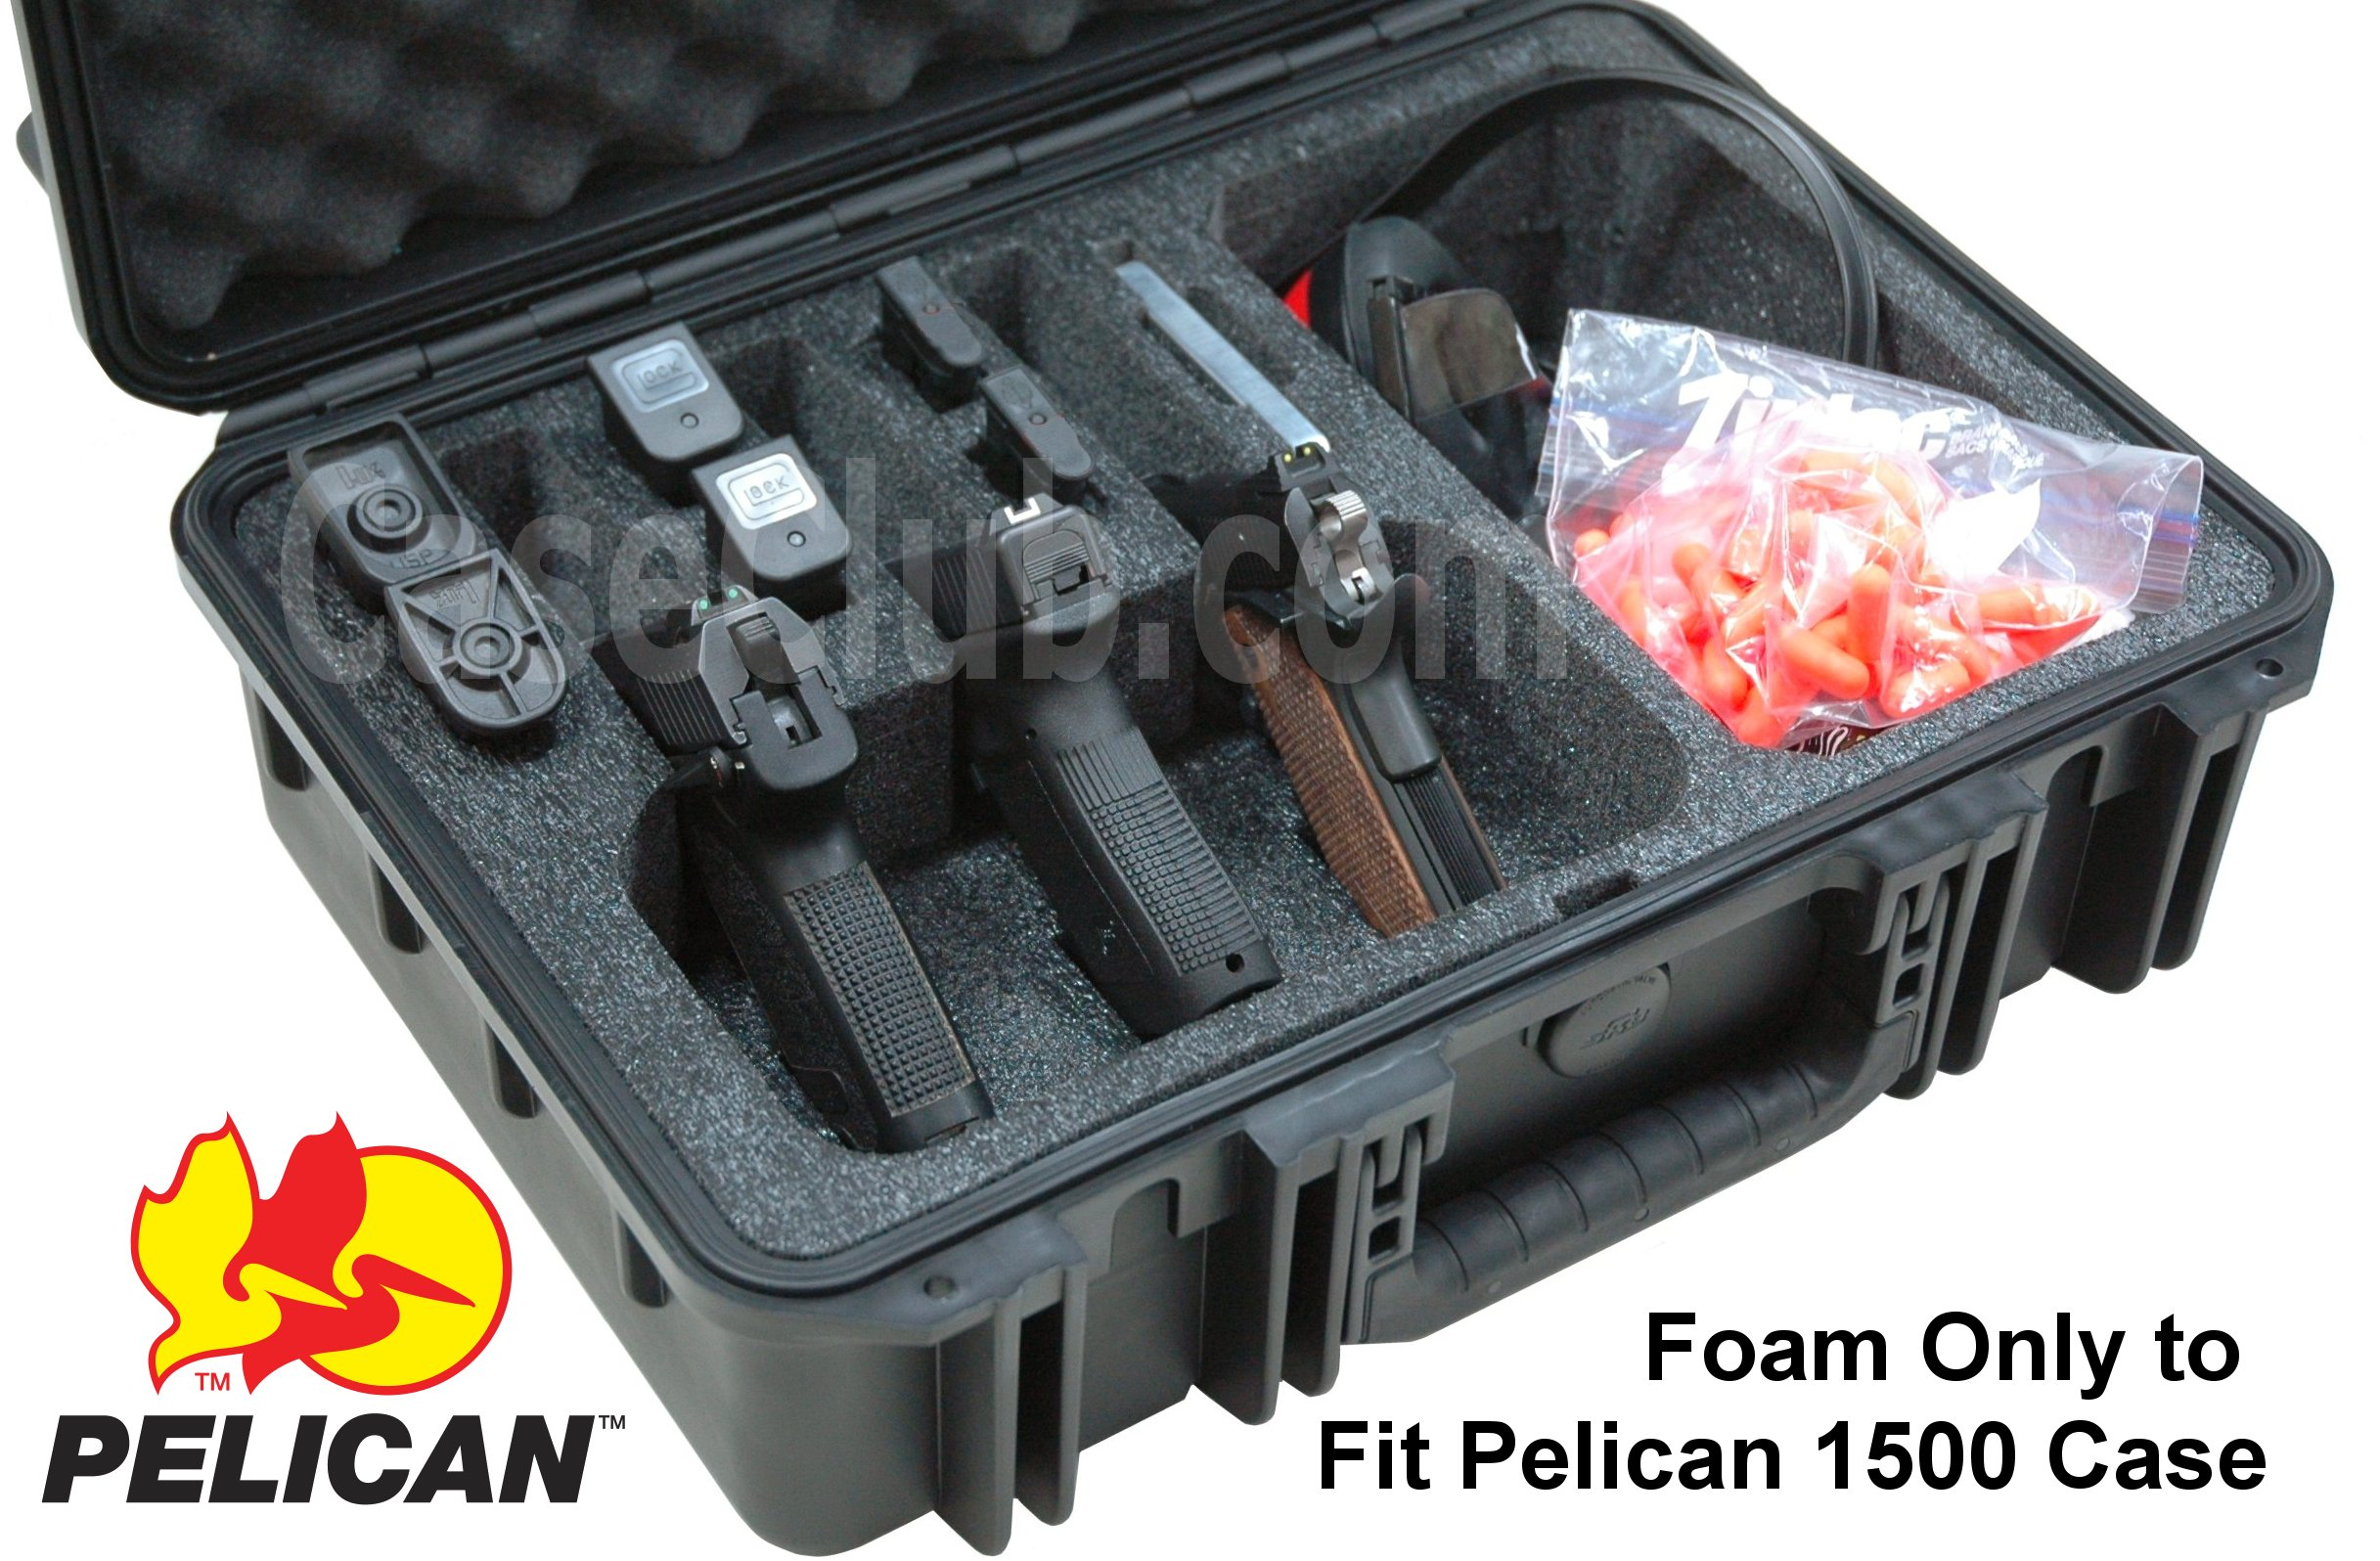 Pelican™ 1500 Case Custom Foam Example: 3 Pistol